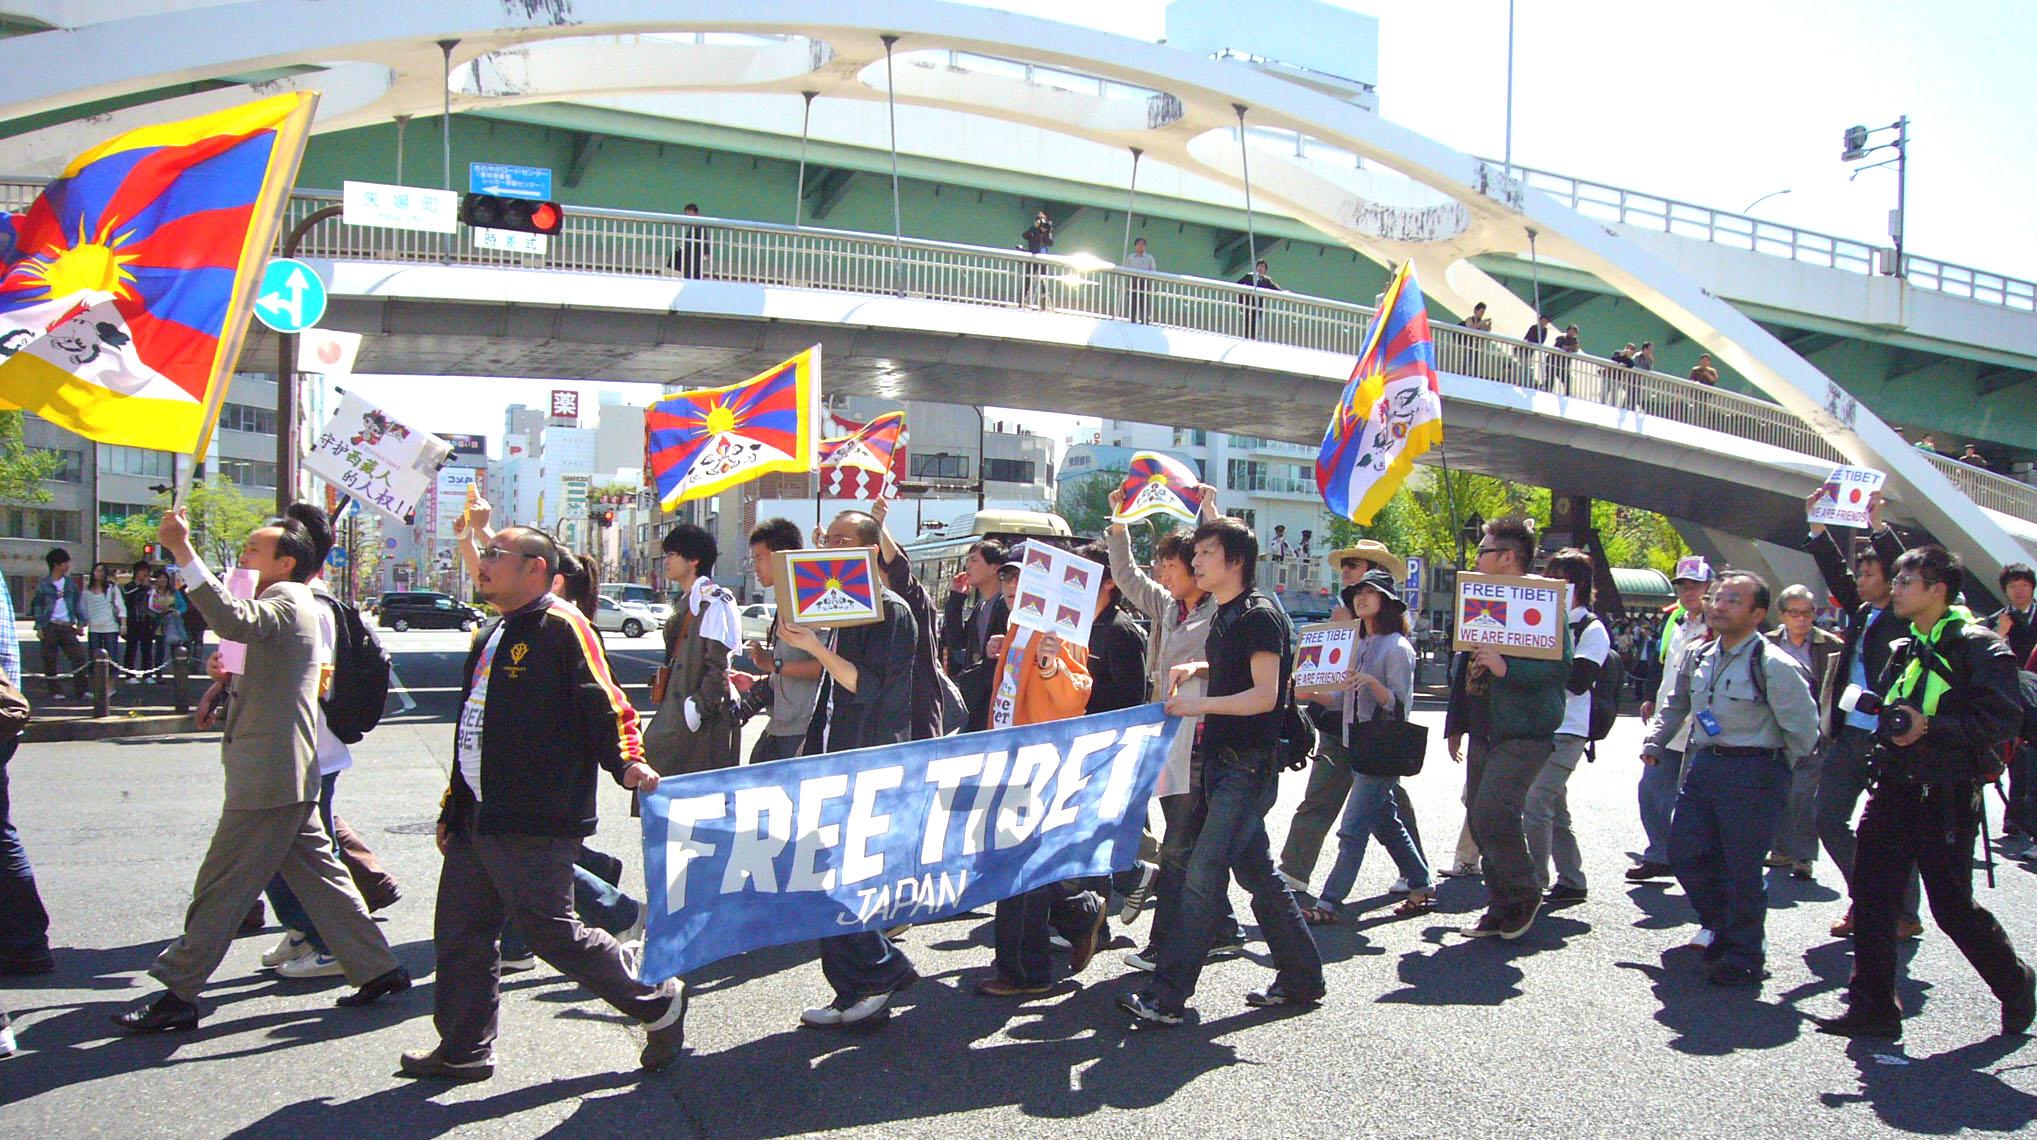 Free_tibet_008